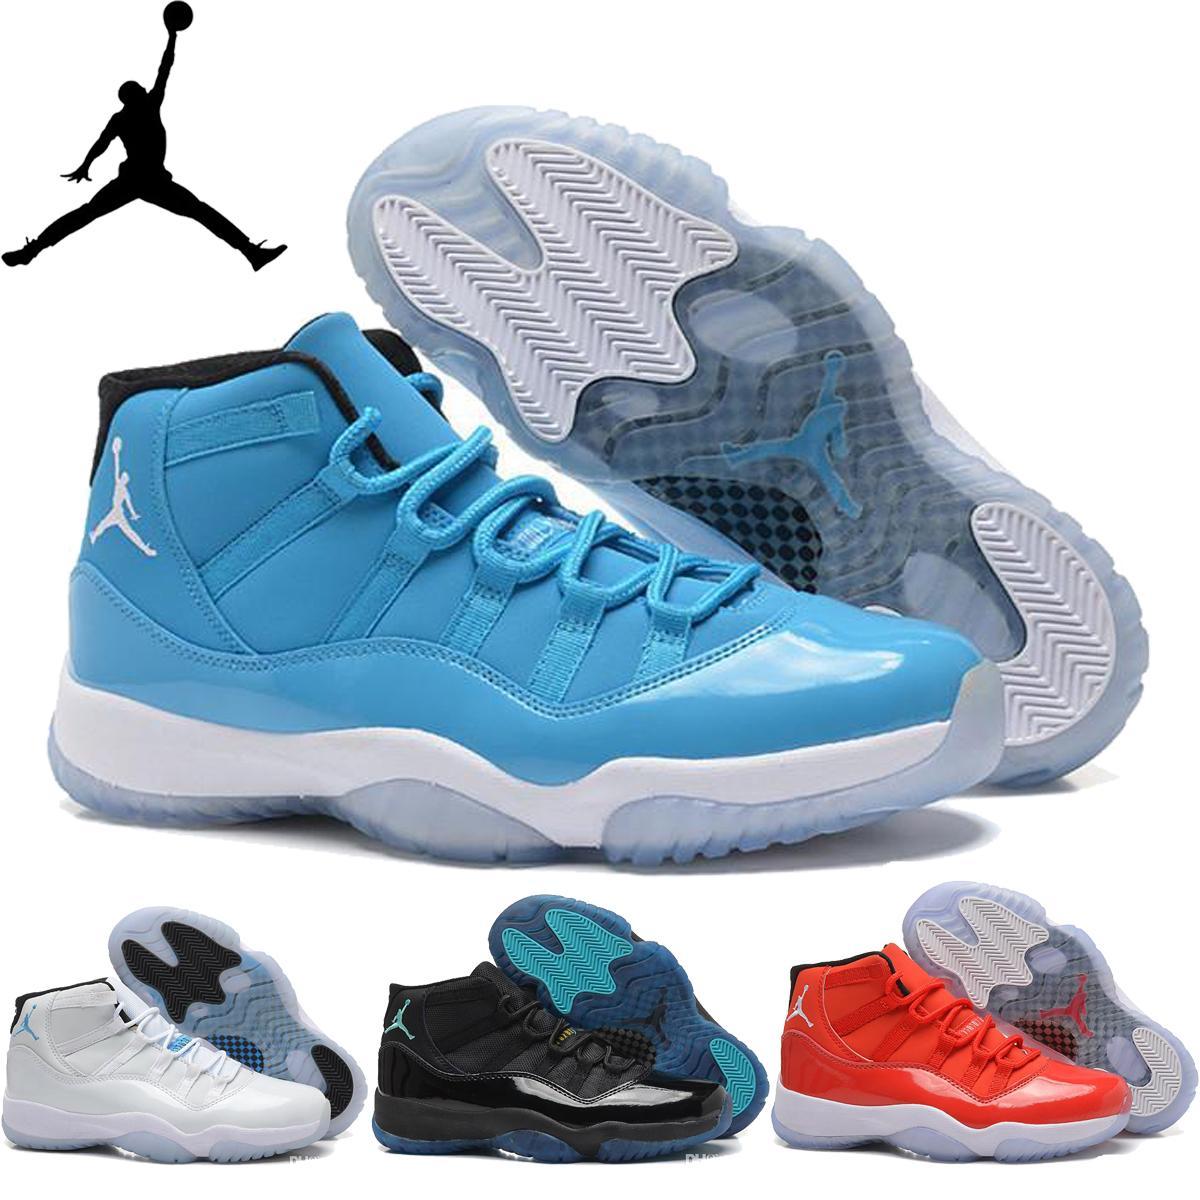 pretty nice da29b 6d945 ... where can i buy compre nike air jordan 11 retro xi homens mulheres  sapatos basquete bred